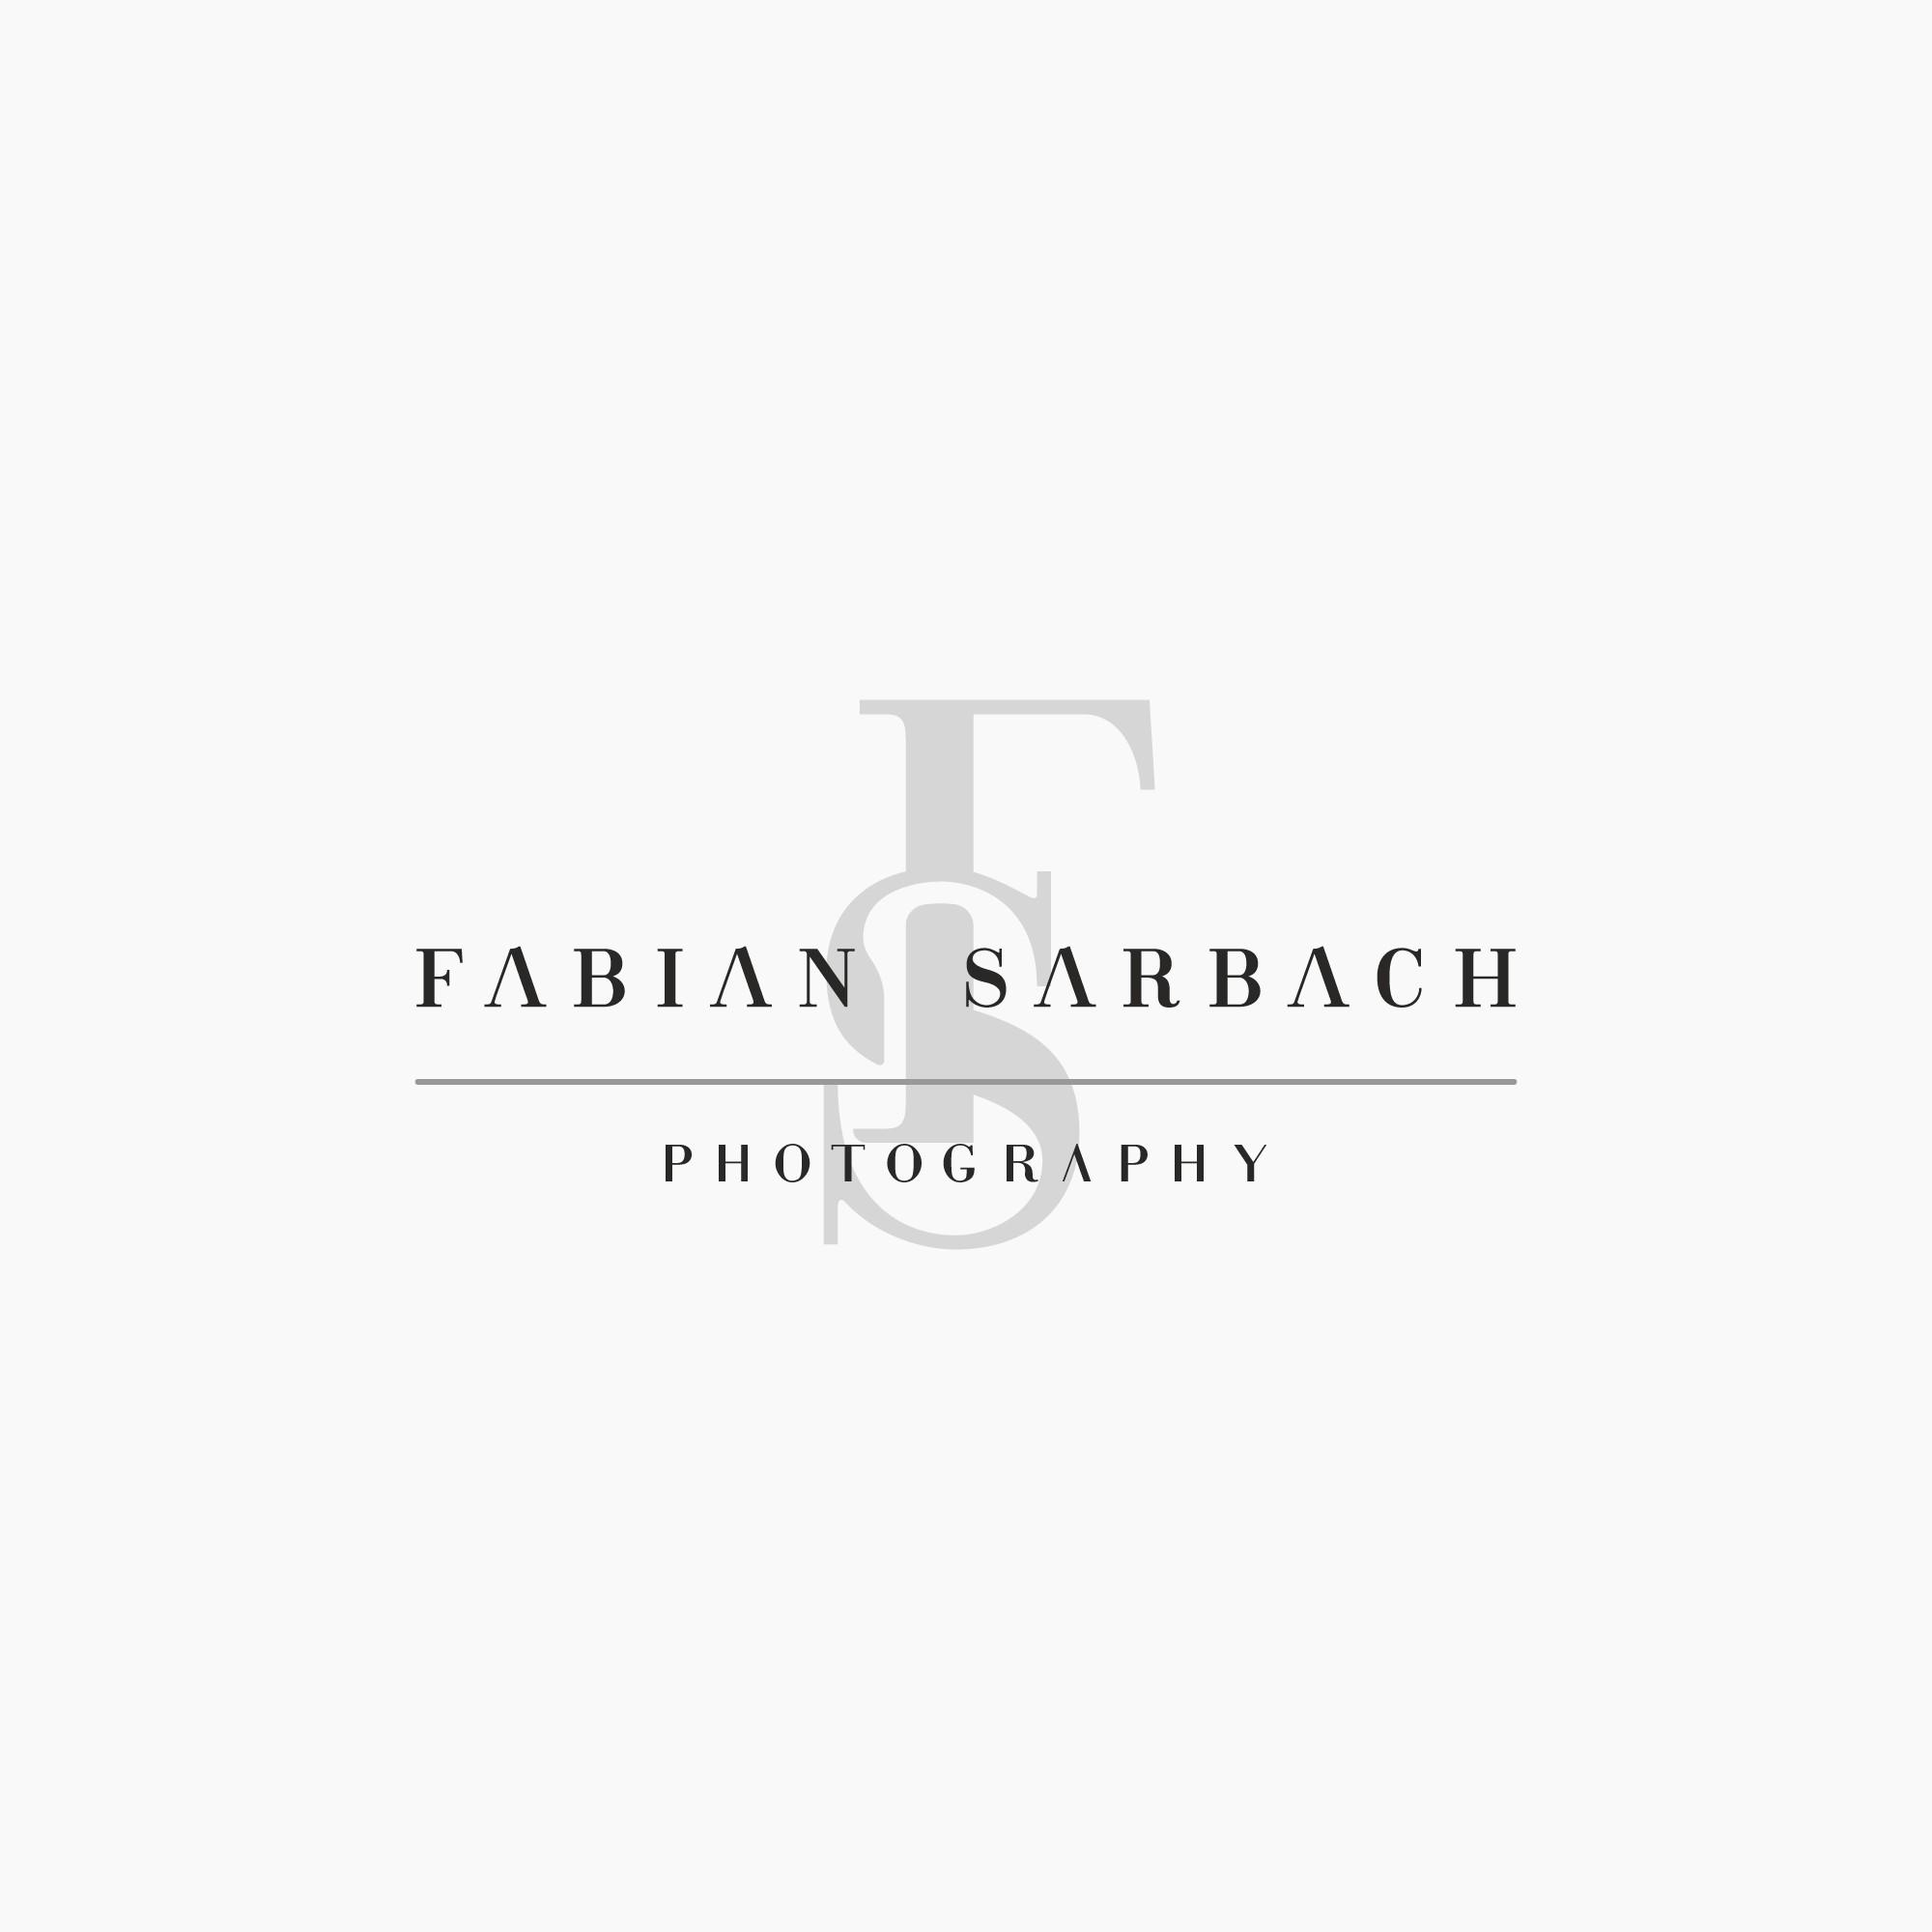 Photographer needs great Logo